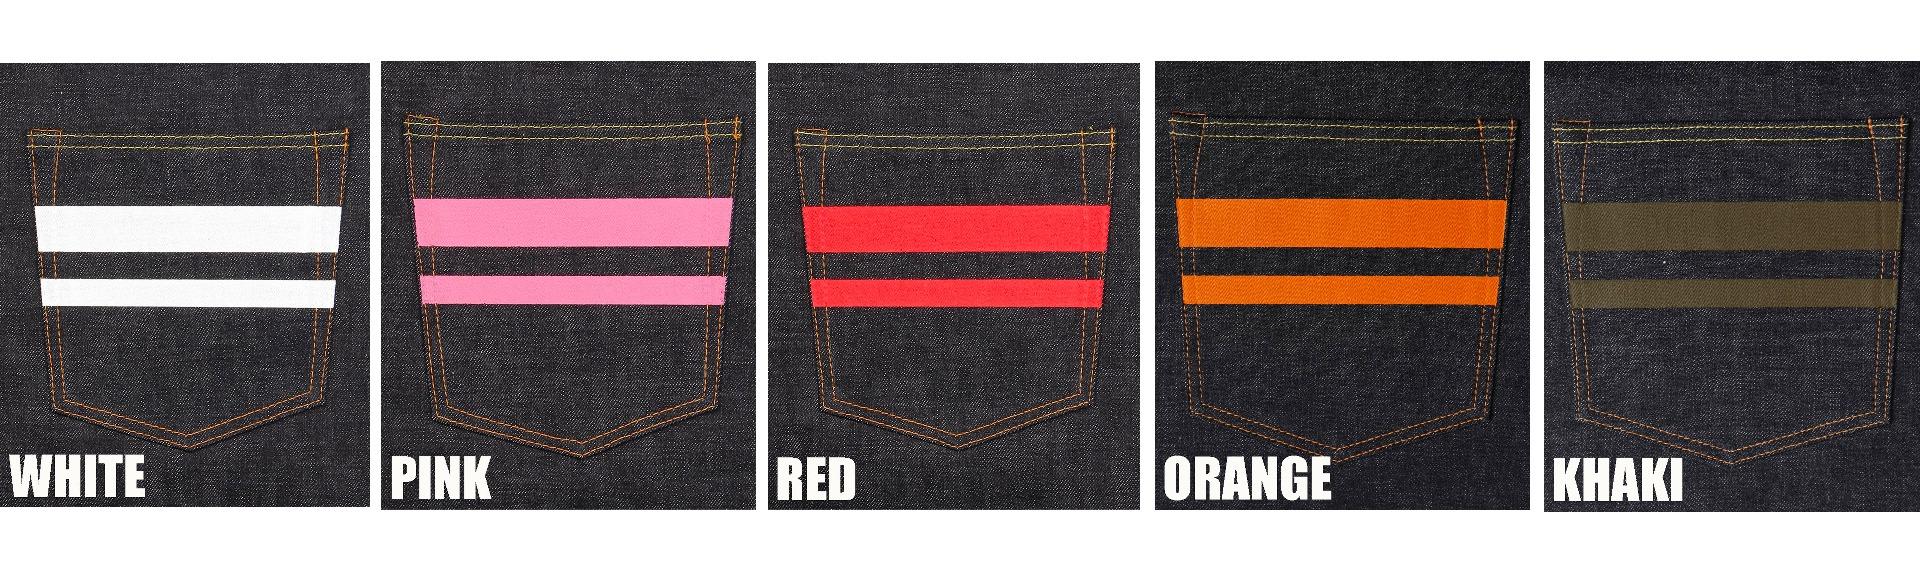 Momotaro Jeans PT001 Silk Screen